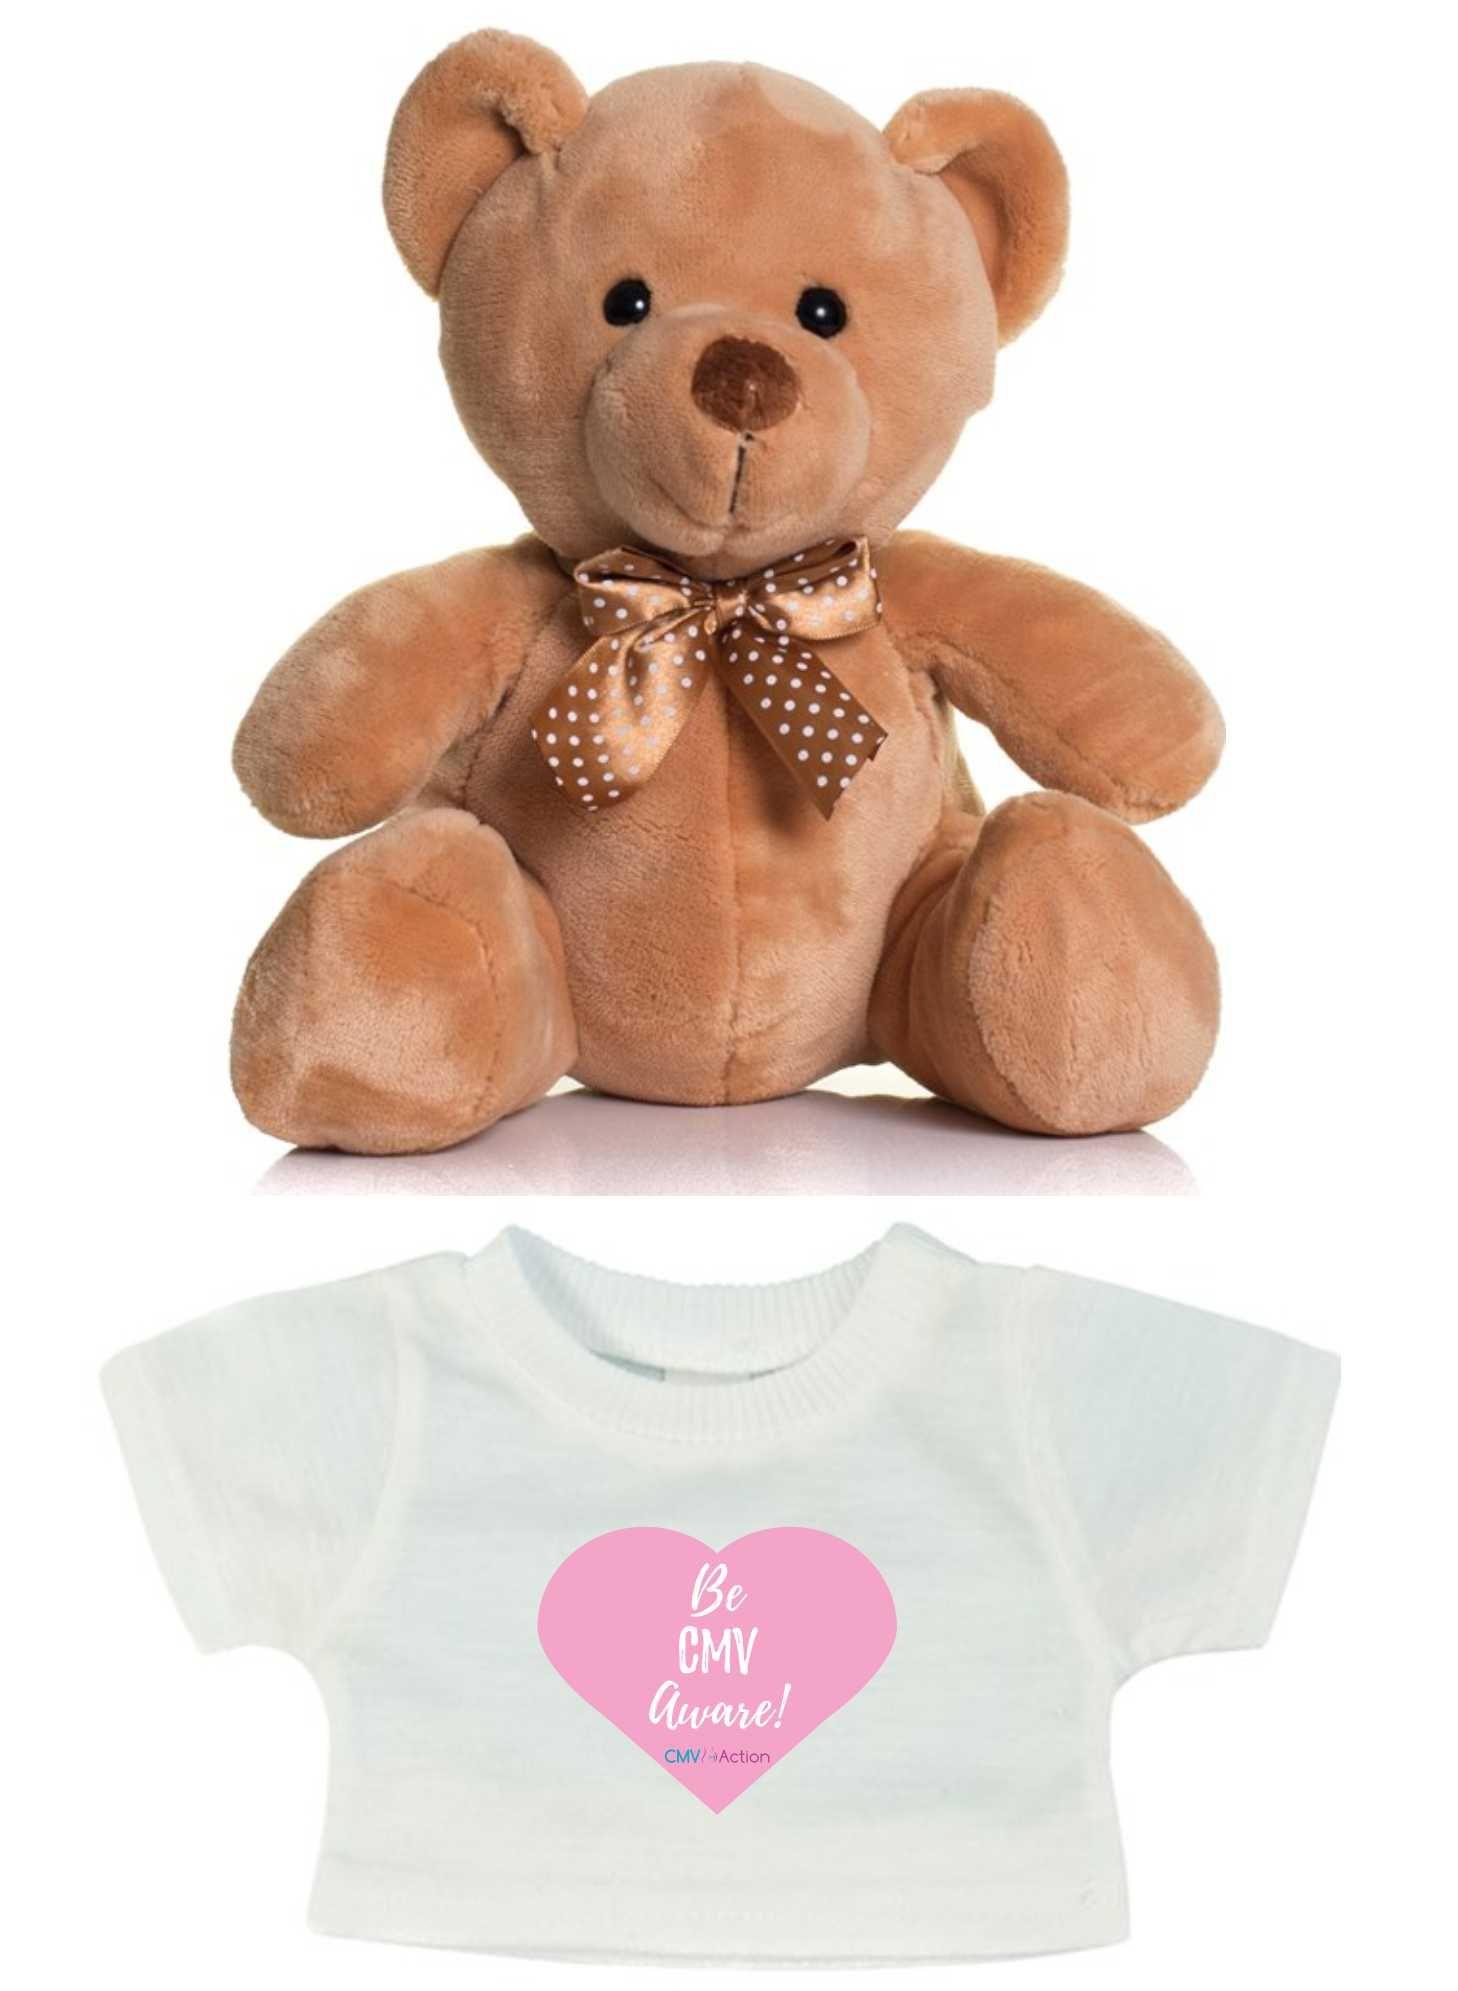 CMV- Teddy & T-shirt with Pink Heart Print